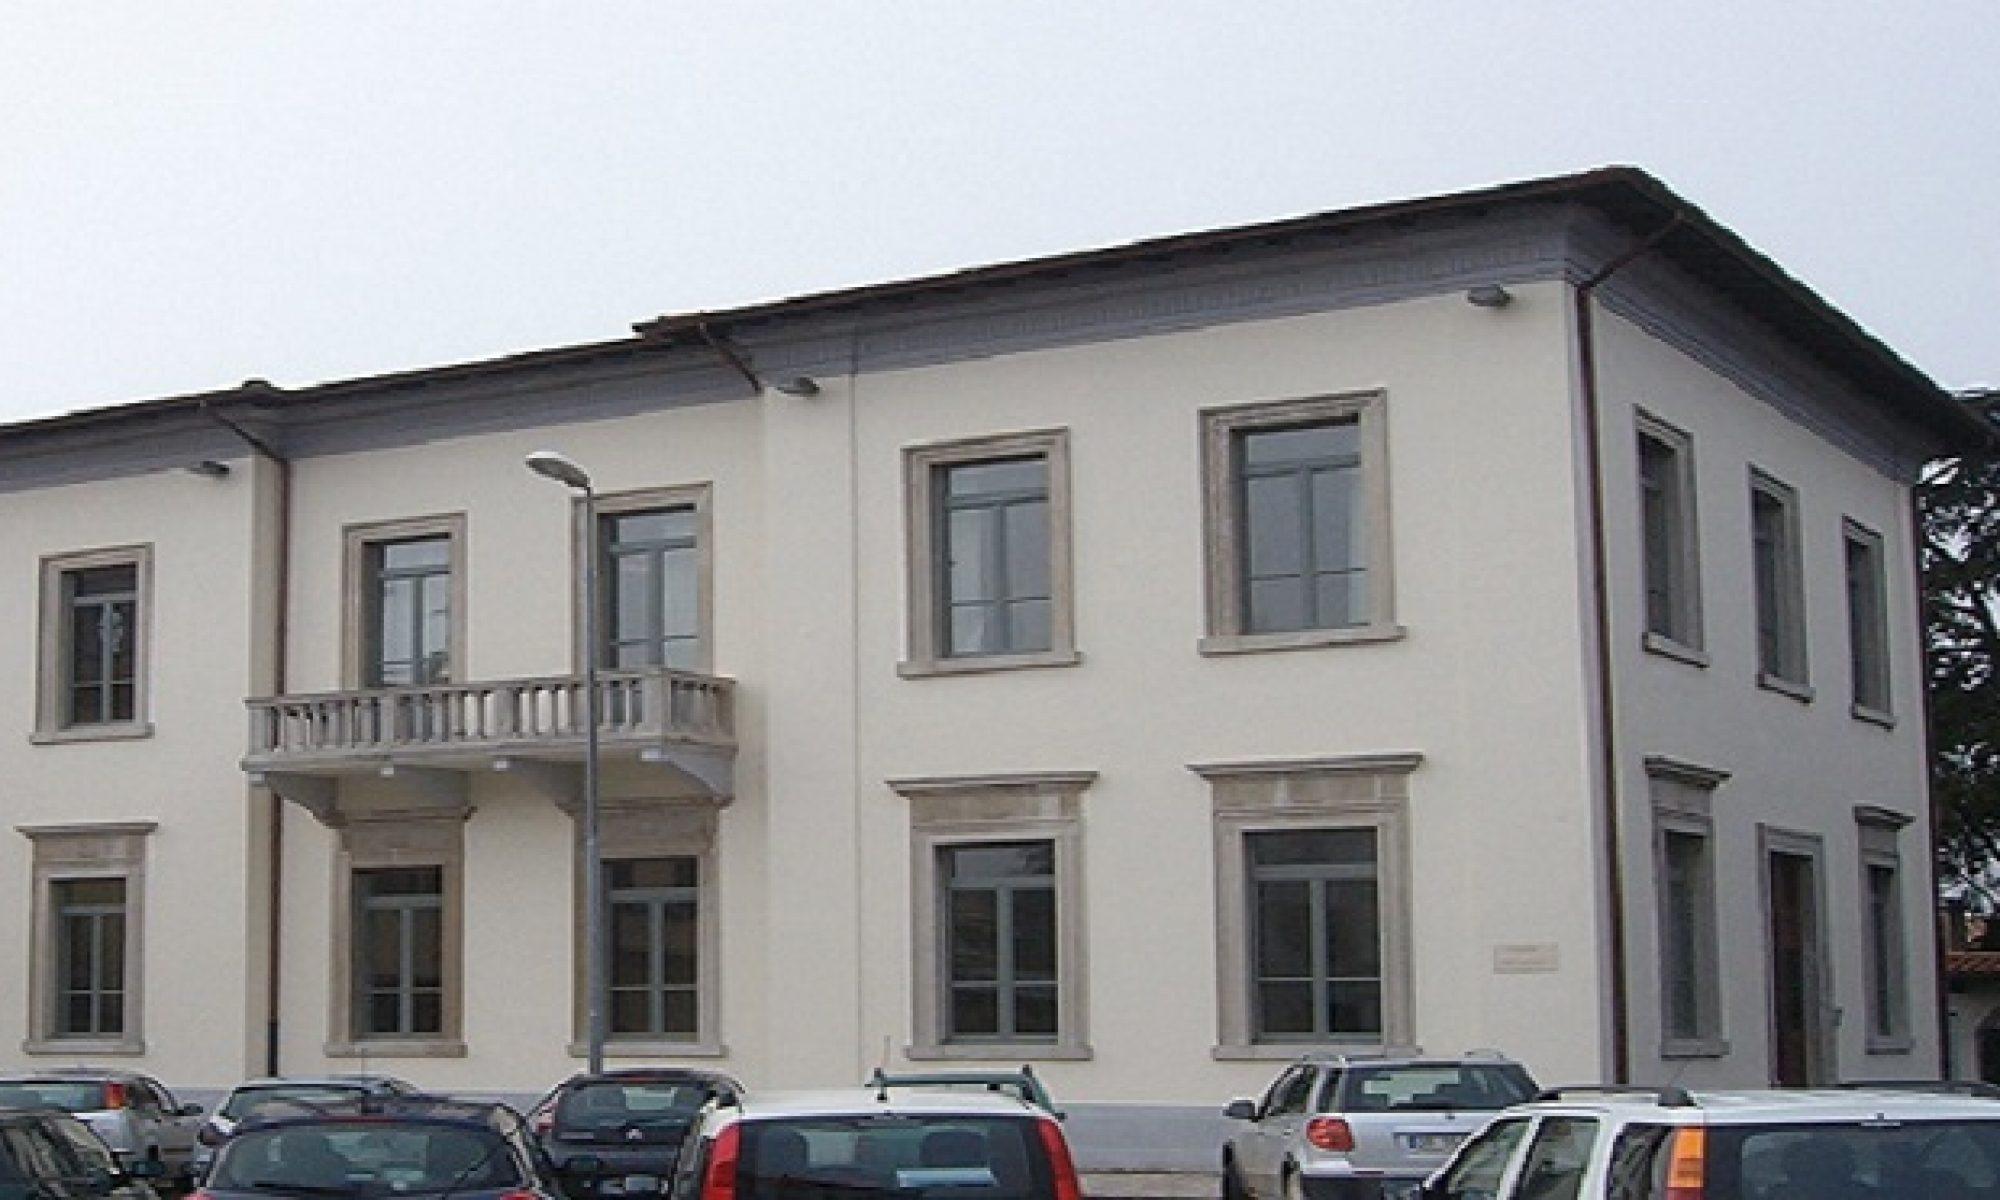 Scuola secondaria primo grado Pierantonio